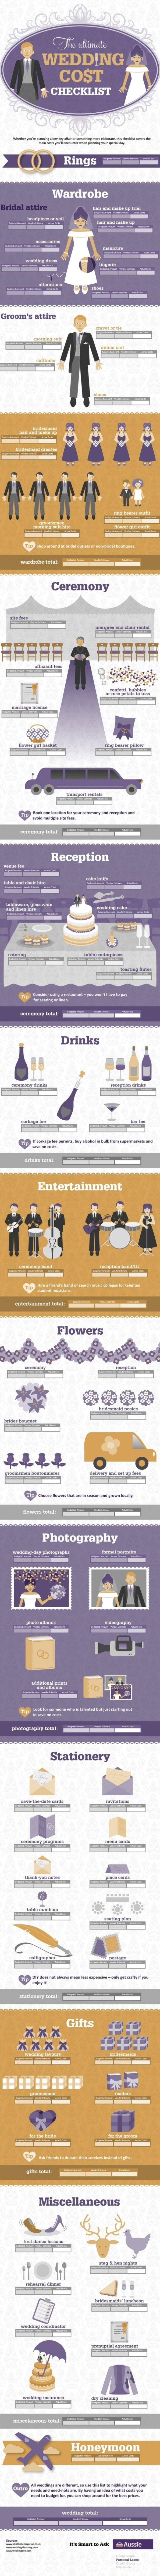 Wedding Cost Checklist